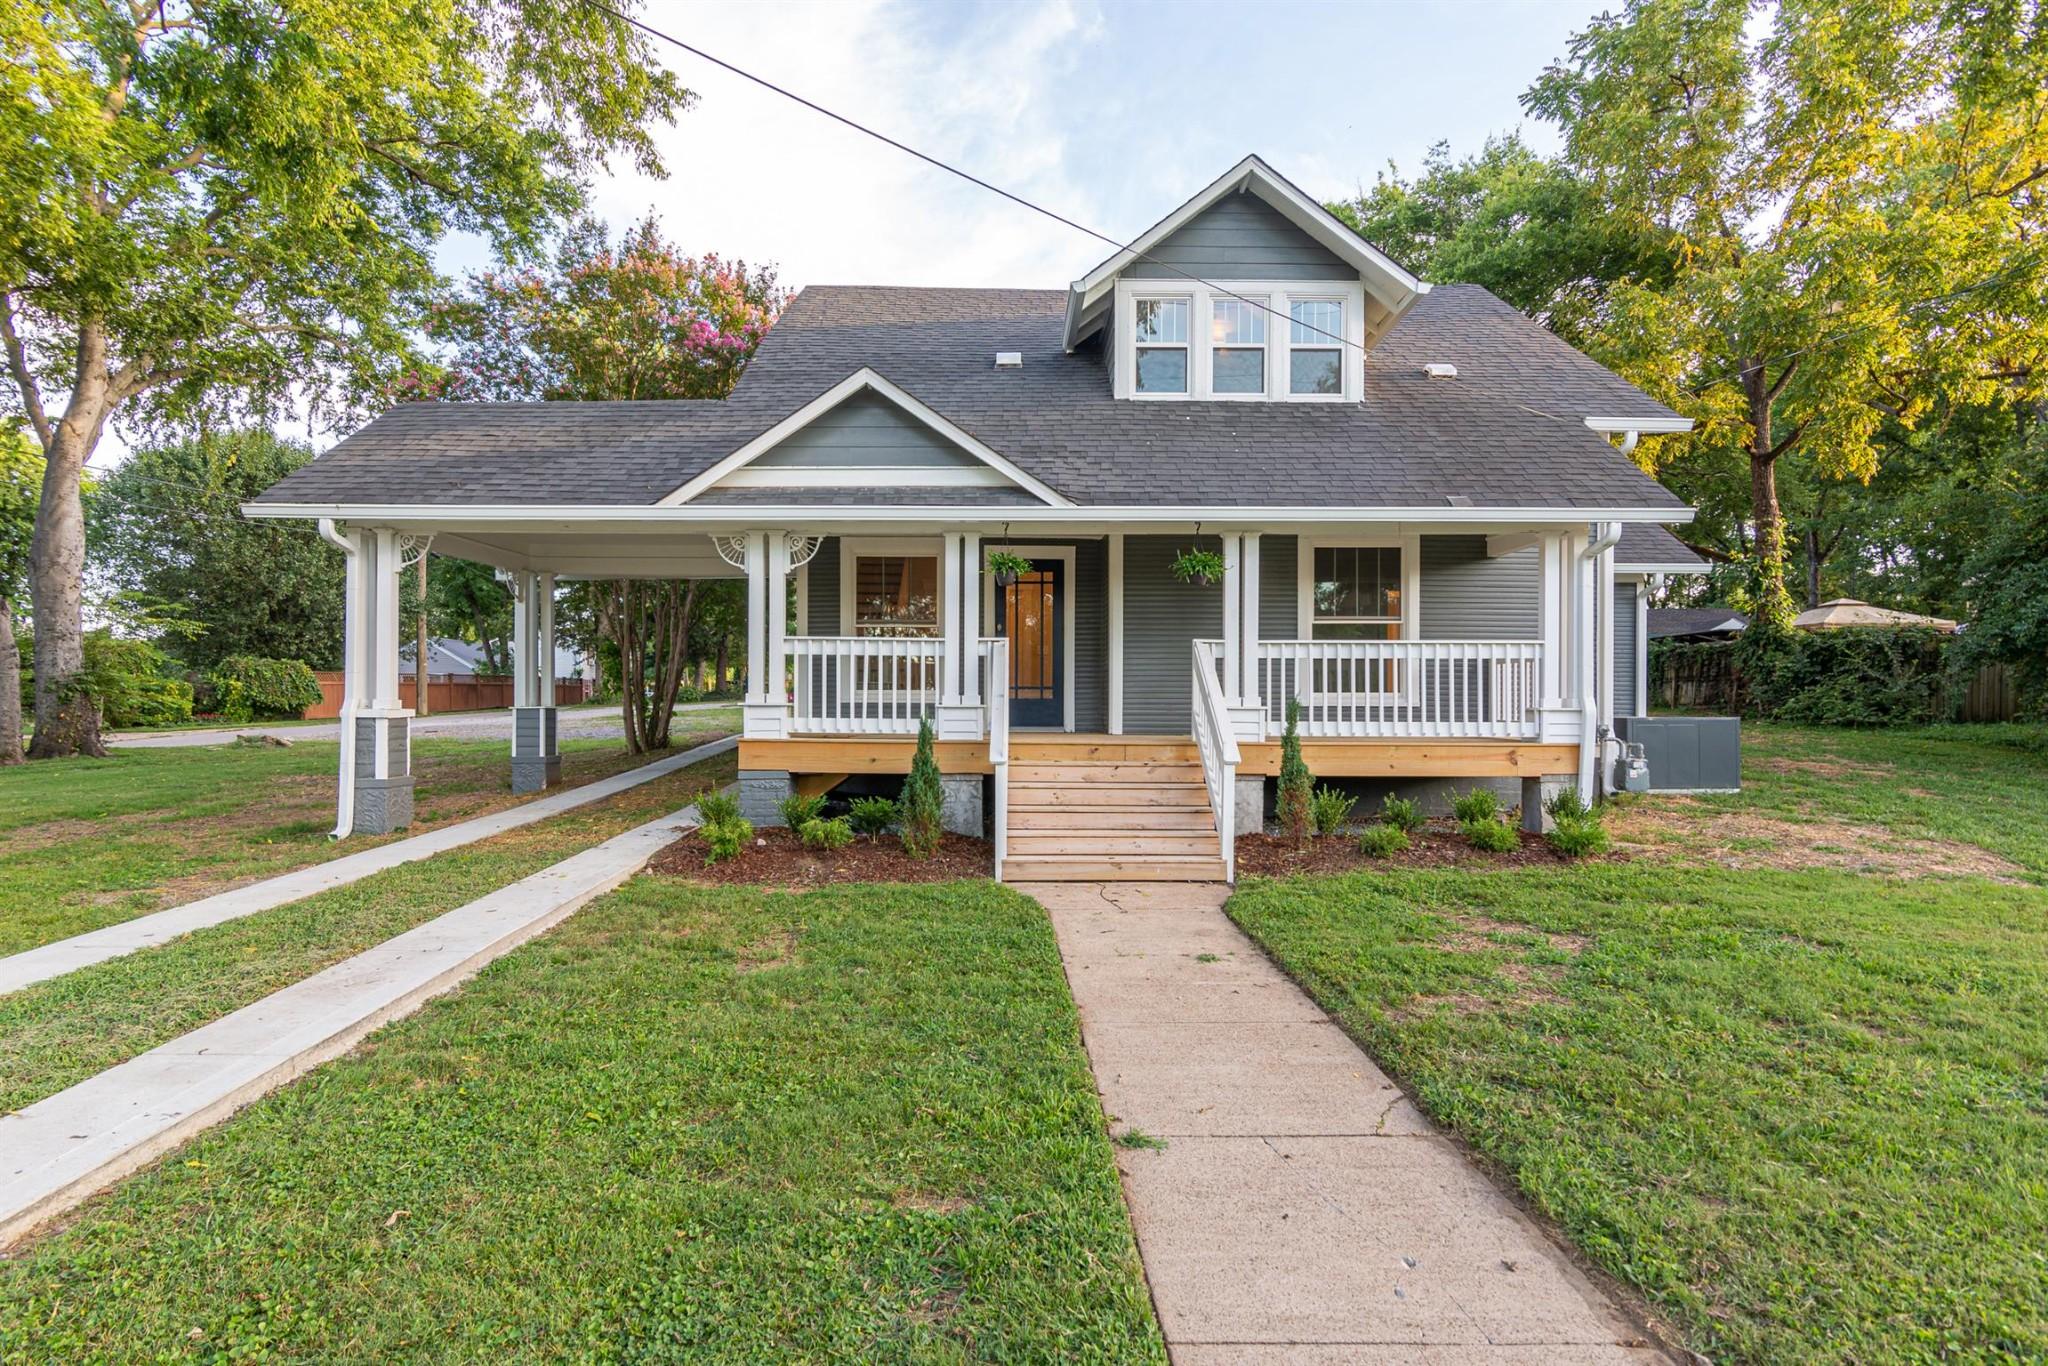 6211 Robertson Ave, Nashville, TN 37209 - Nashville, TN real estate listing